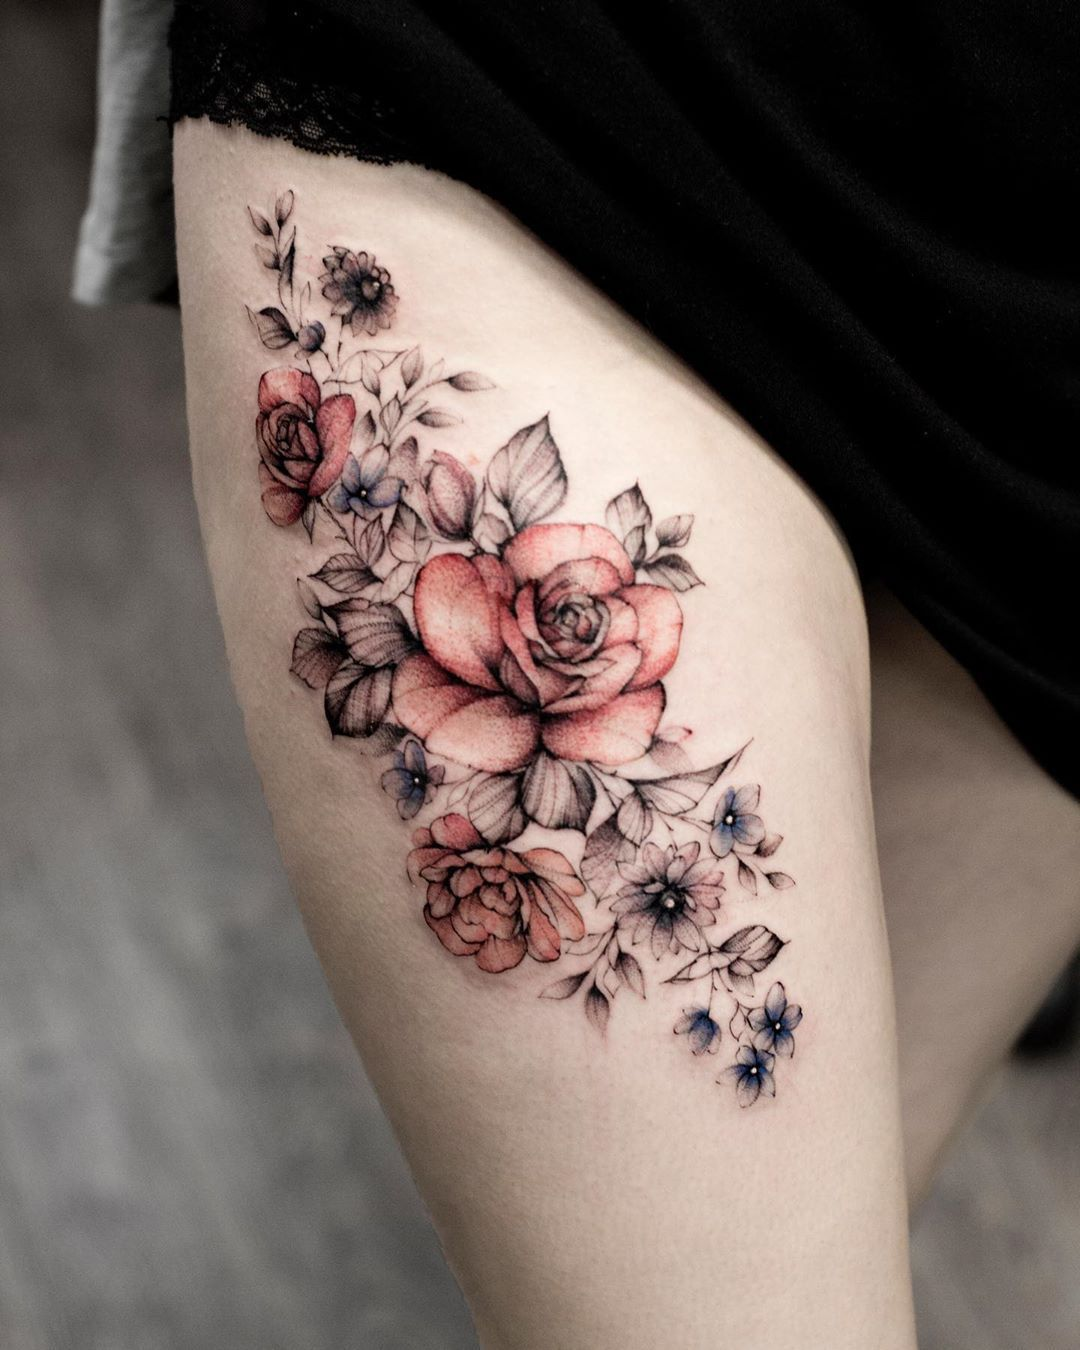 50 Sweet Summer Colorful Flower Tattoo Designs Colorful Designs Flower Summer Sweet In 2020 Colorful Flower Tattoo Rose Tattoos For Women Flower Tattoo Shoulder